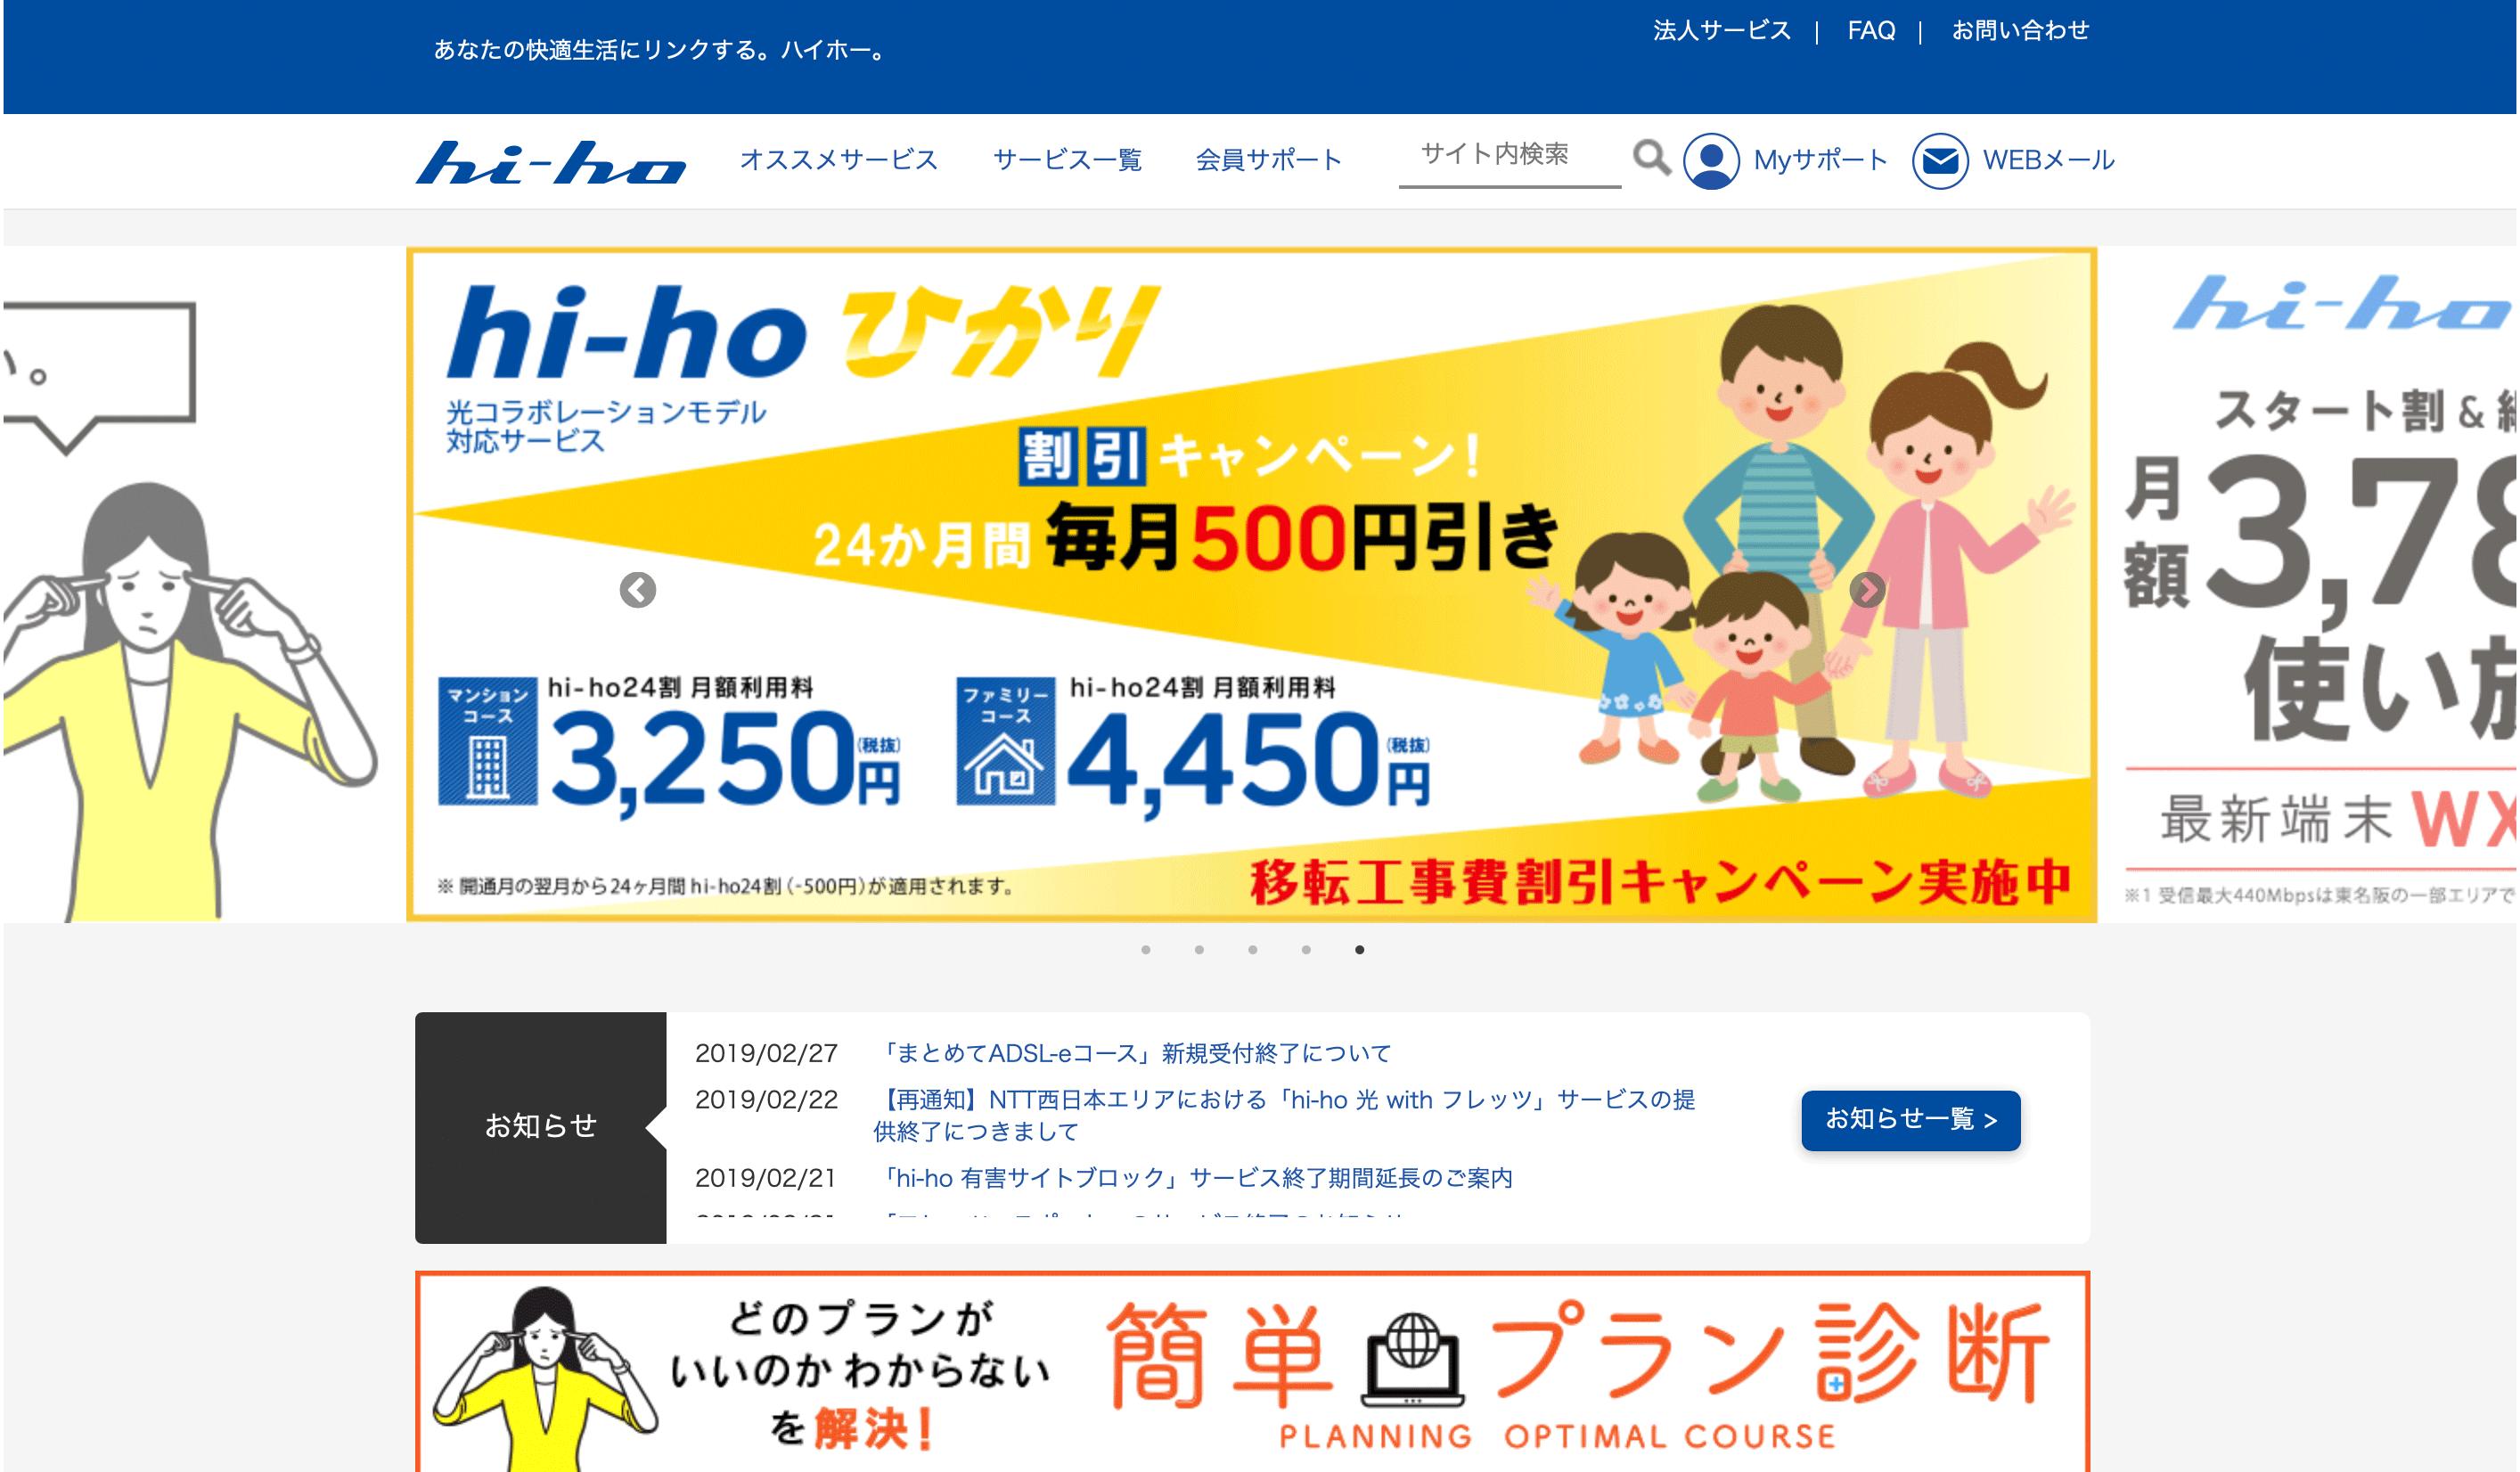 【hi-ho】ライフスタイルに合わせた格安SIM!!